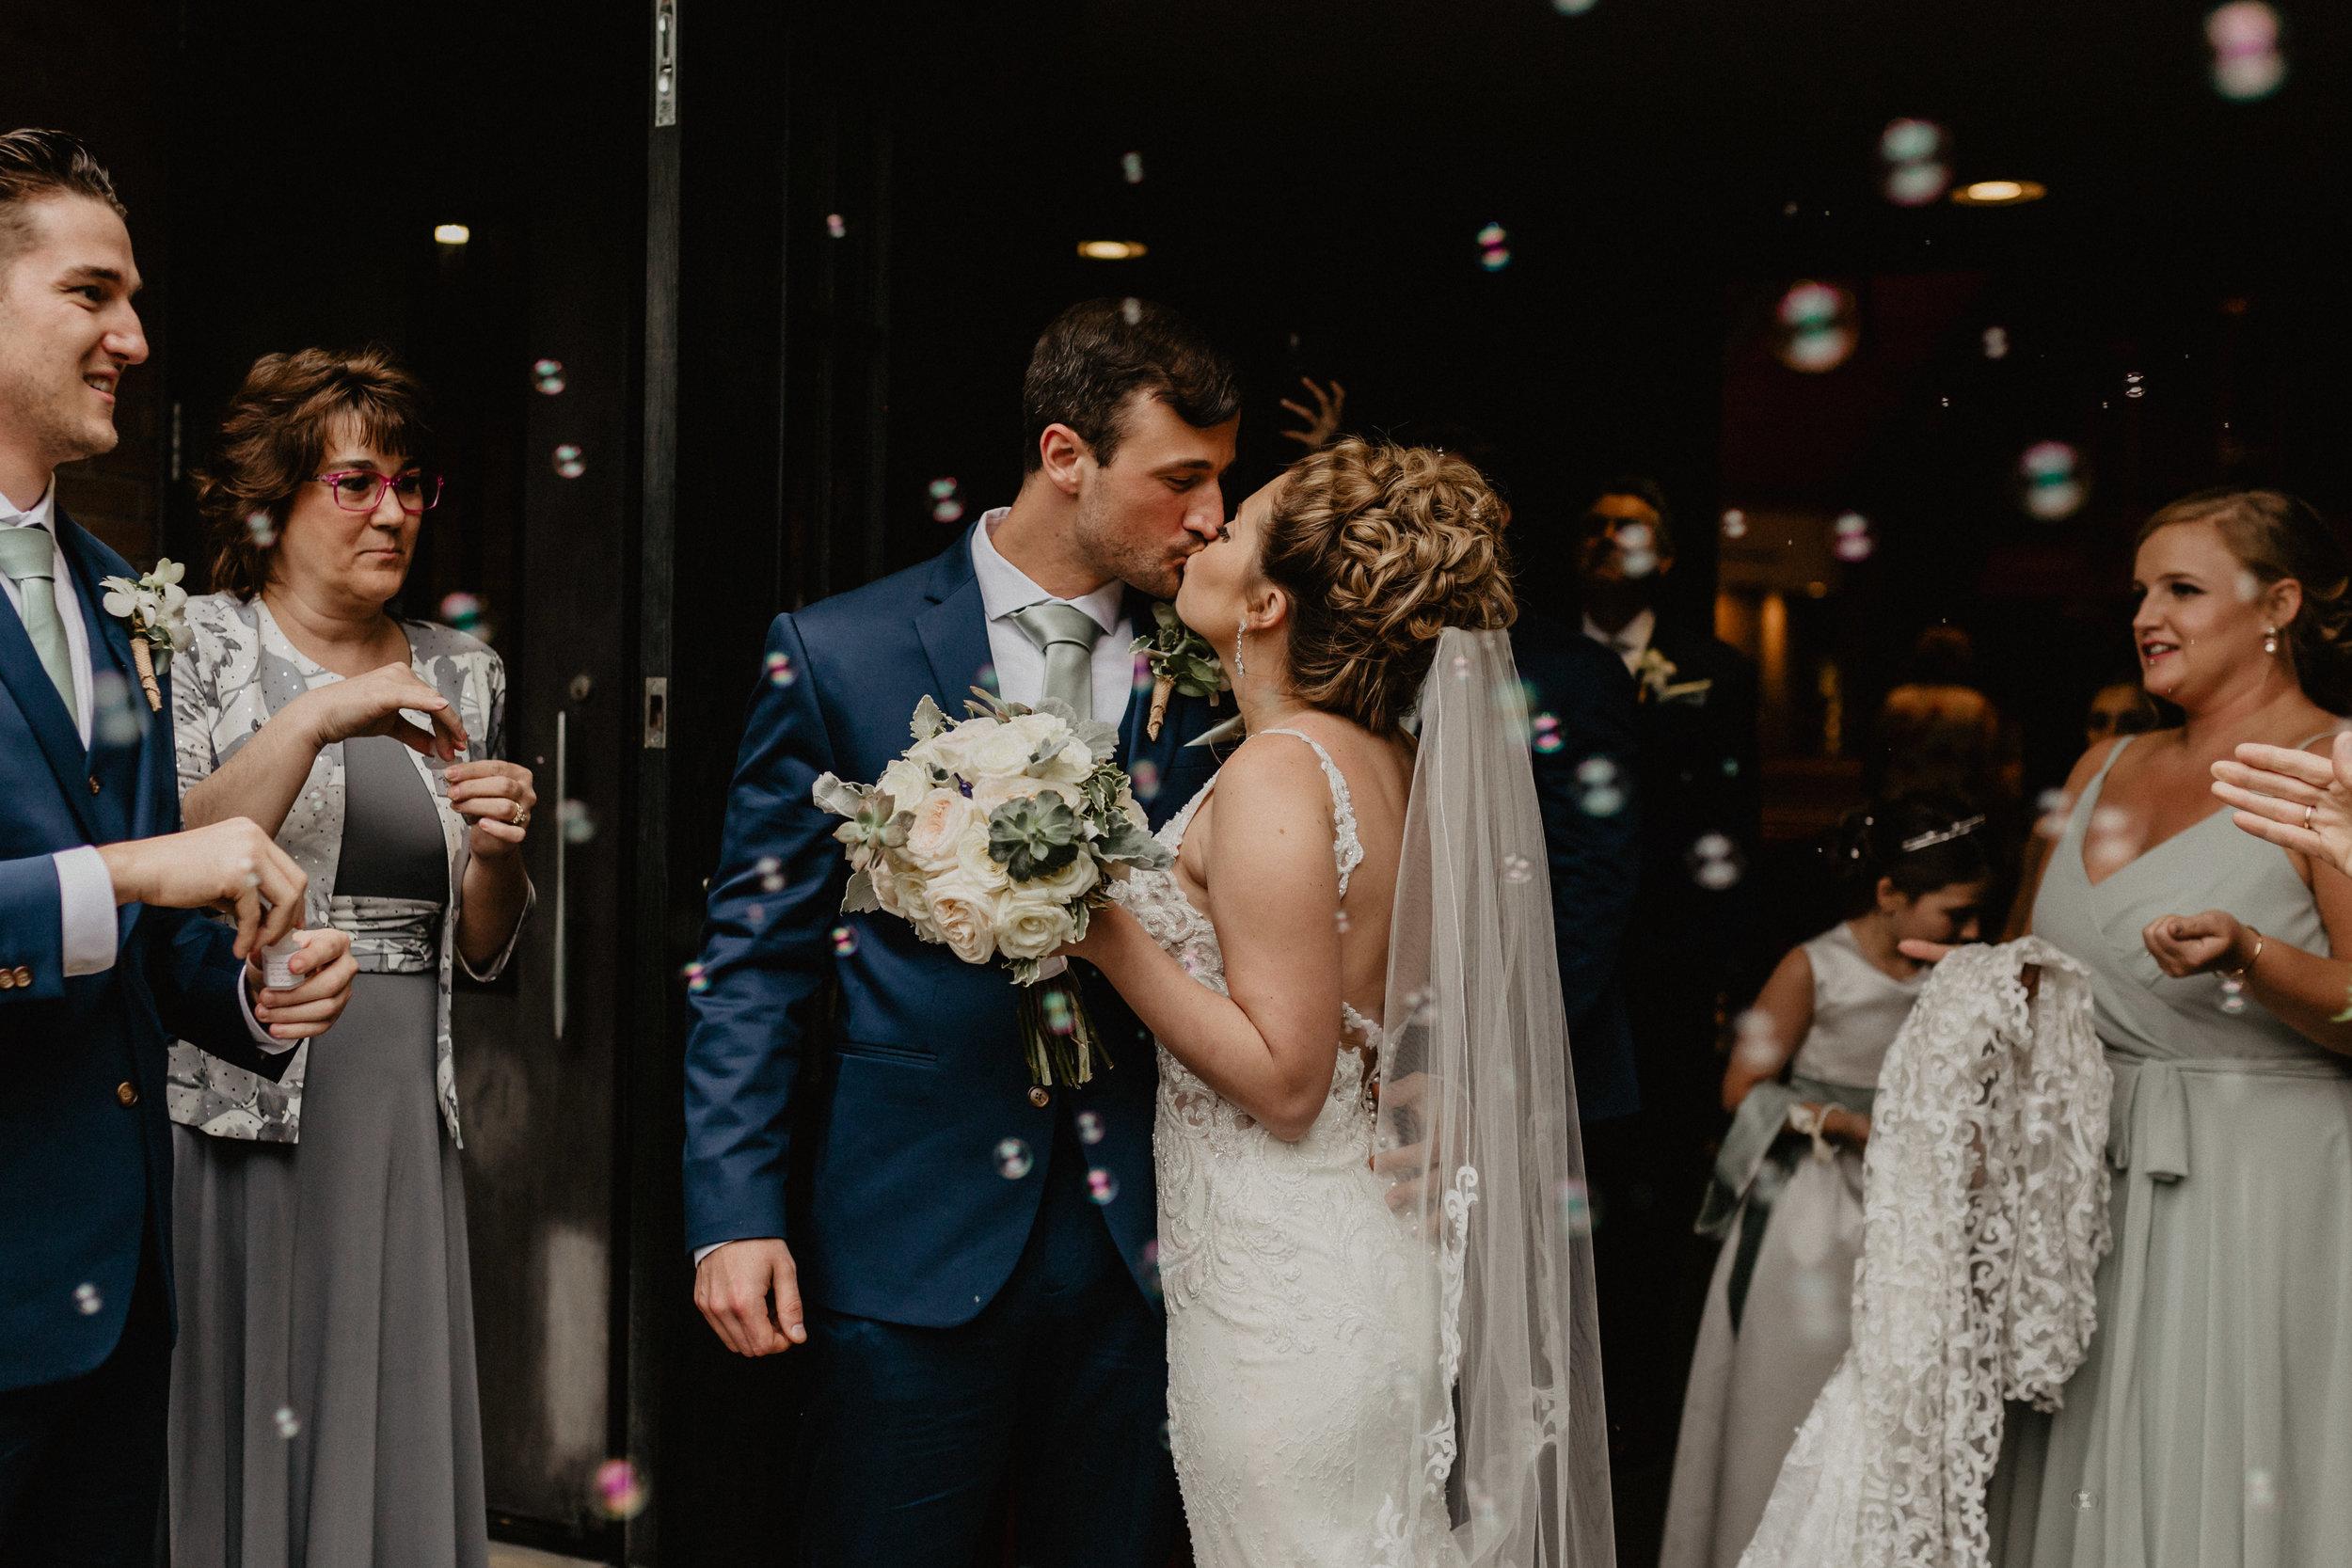 old_daley_on_crooked_lake_wedding_-53.jpg